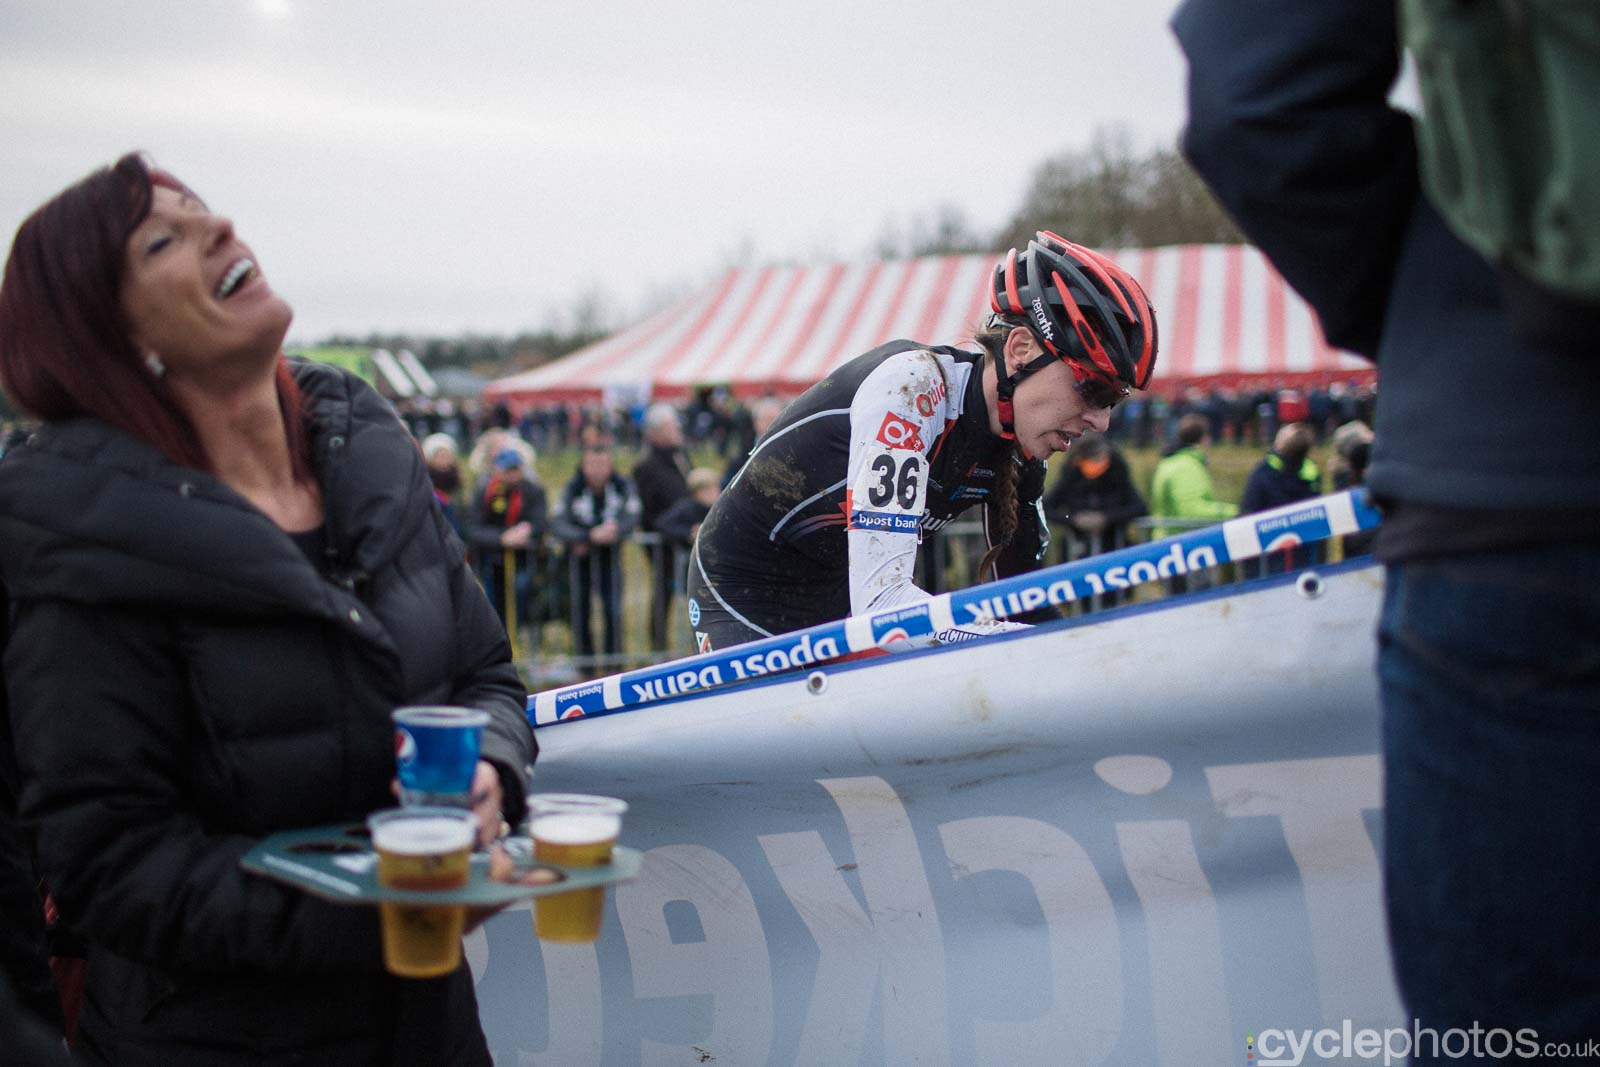 2016-cyclephotos-cyclocross-gpsvennys-142322-beer-and-rider